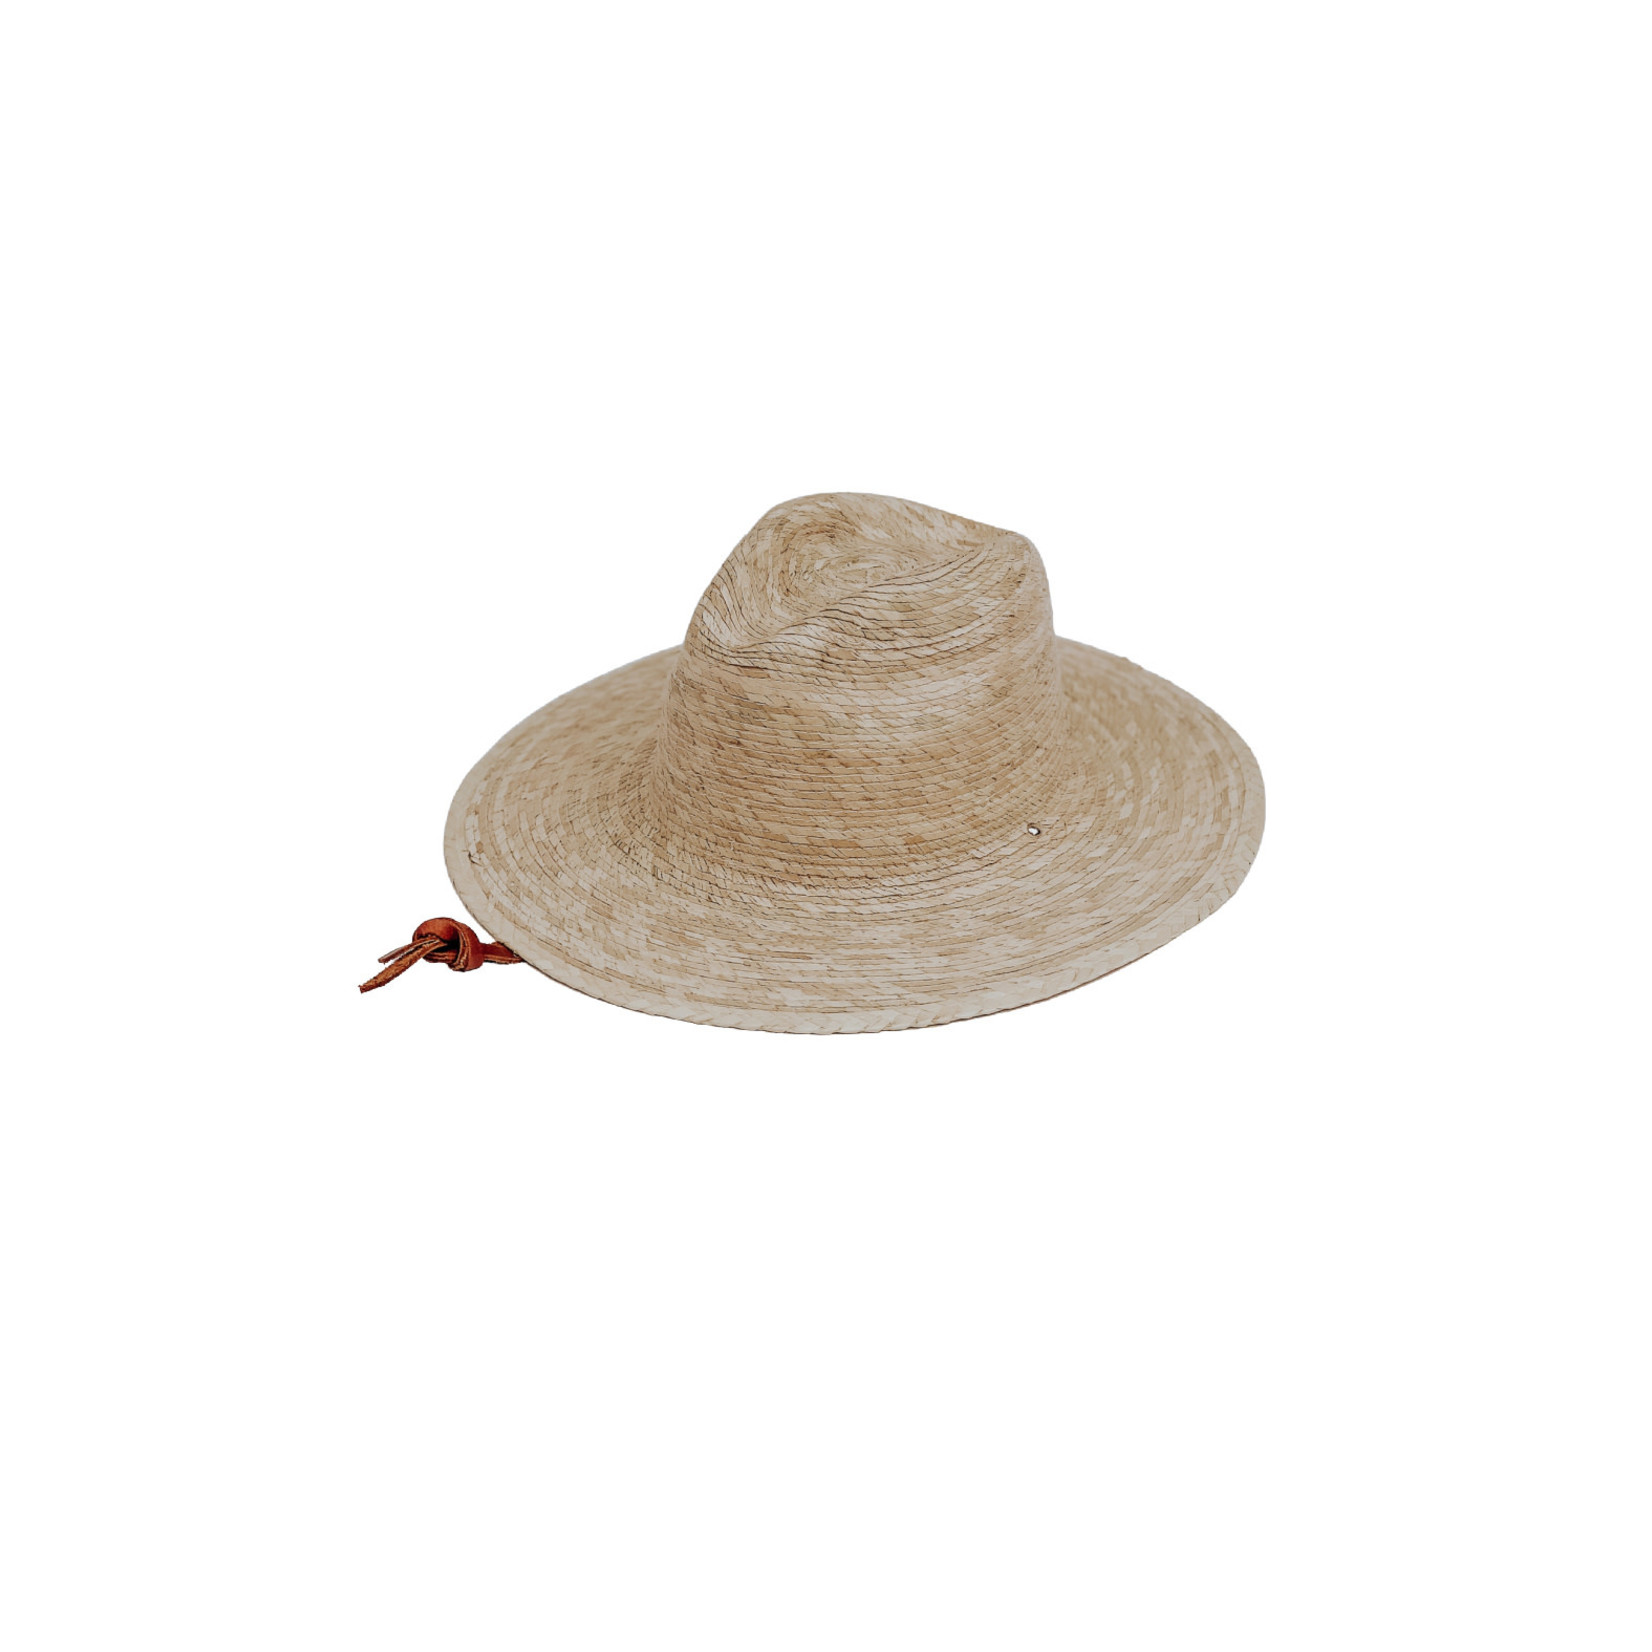 L E A H Straw Fedora Hat